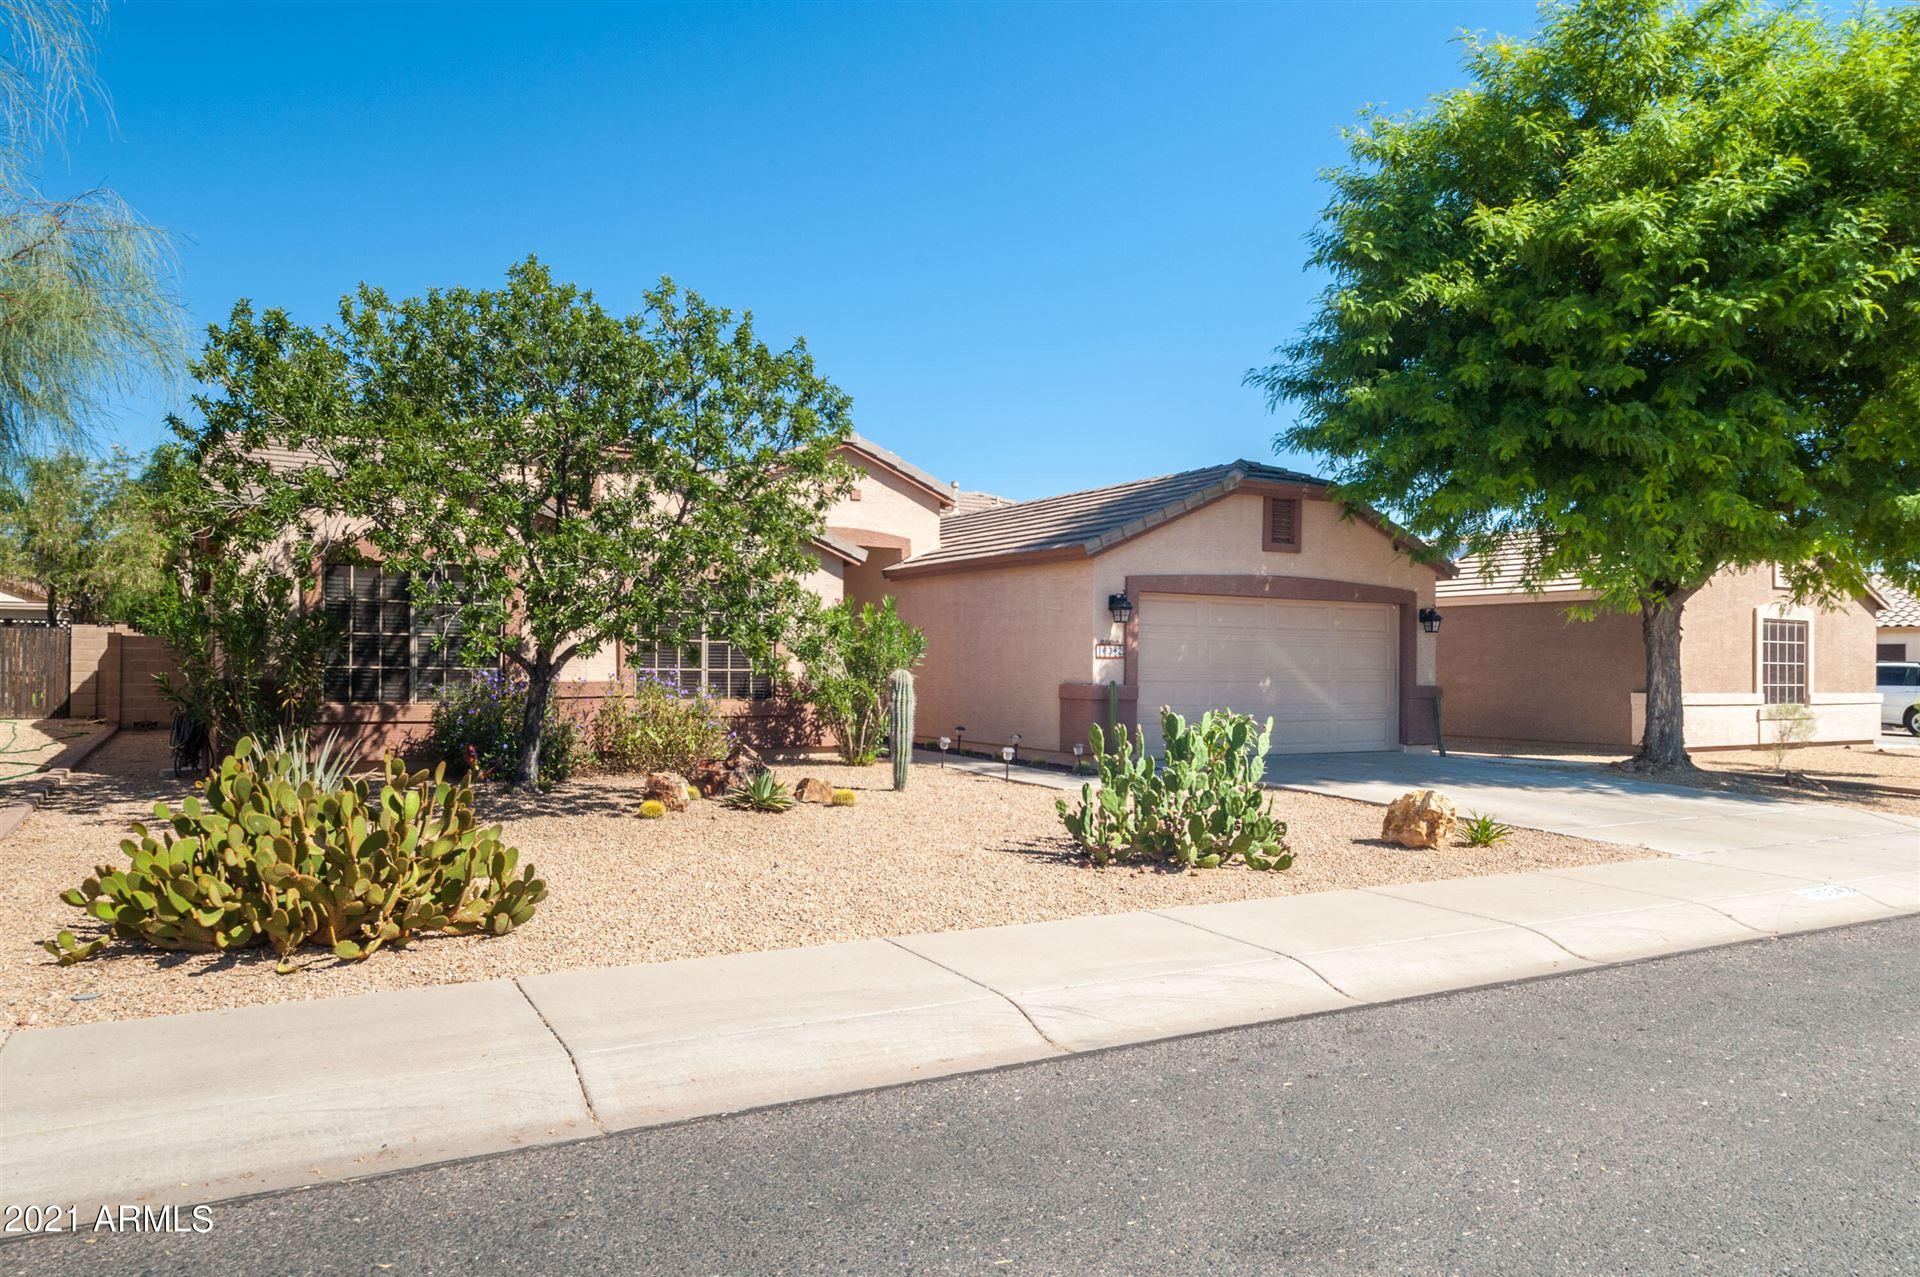 Photo of 16342 W IRONWOOD Street, Surprise, AZ 85388 (MLS # 6306574)